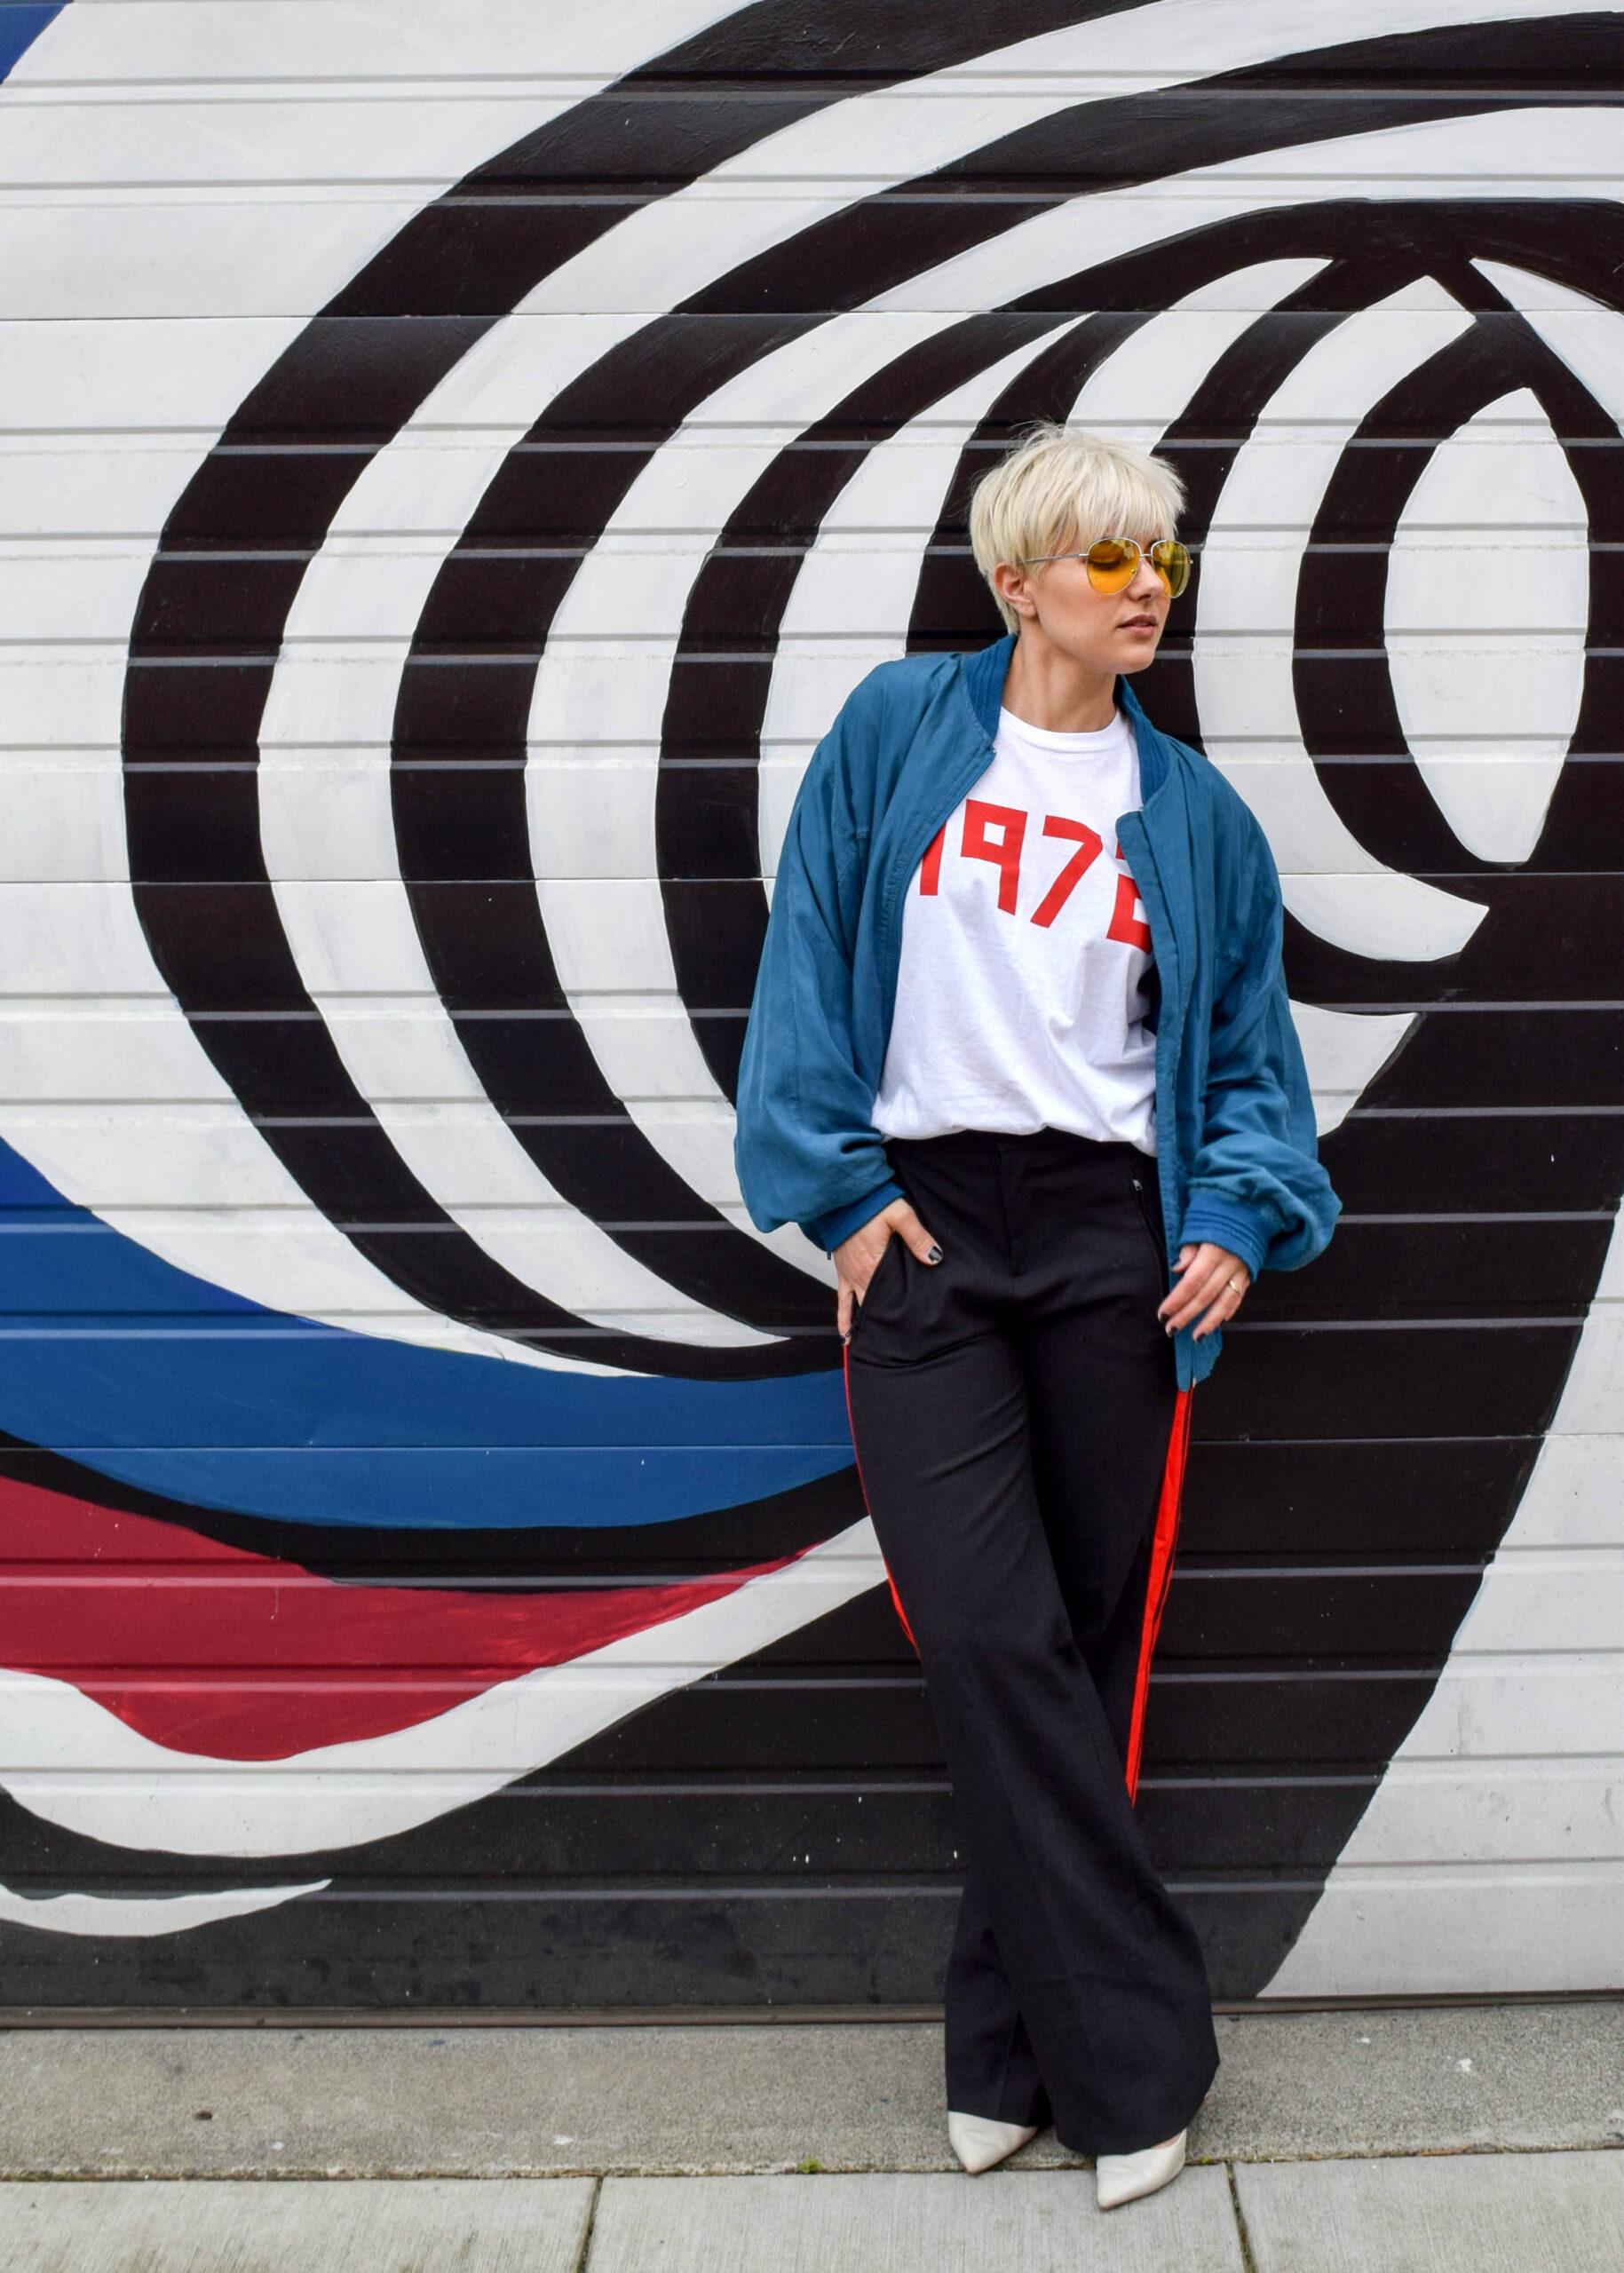 The Retro Look 1 - 3 New Ways to Wear Your Bomber Jacket for 2017 - BloggerNotBillionaire.com